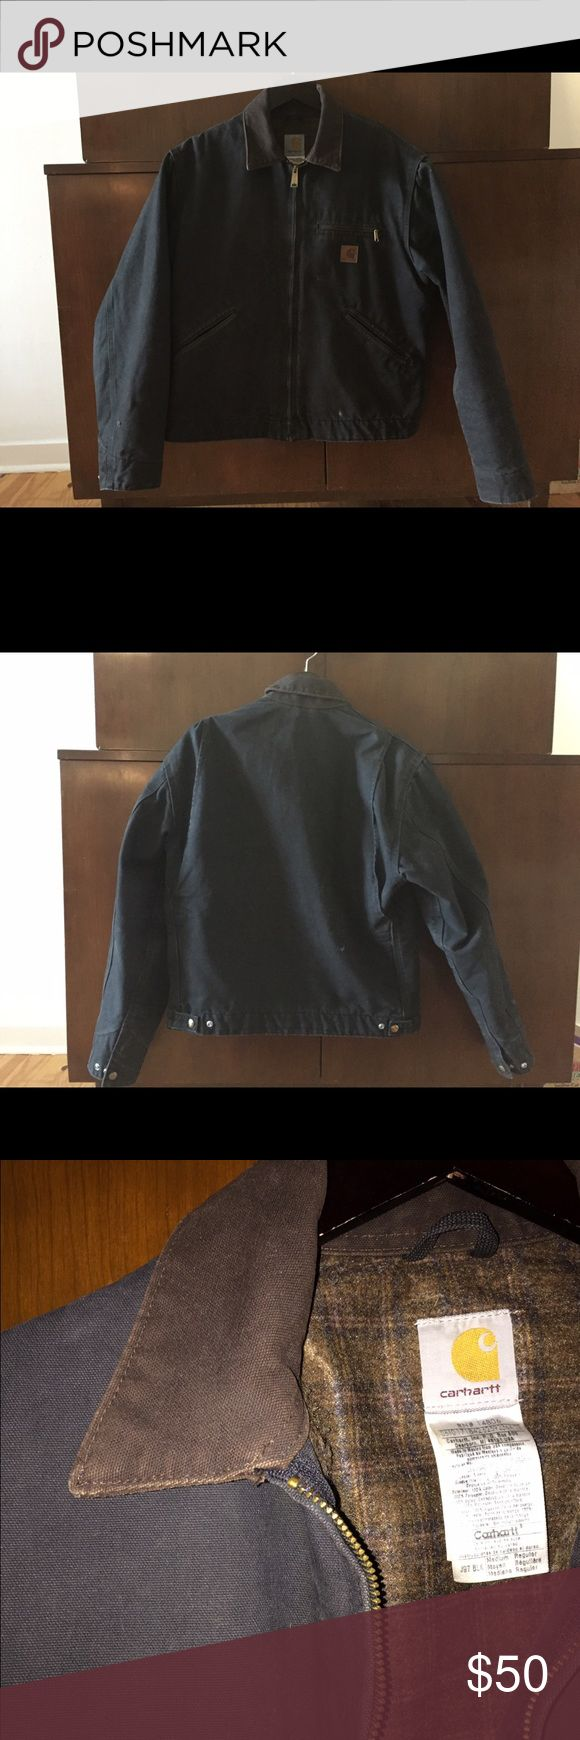 Men's Carhartt Jacket. Size M. Black. Men's Carhartt jacket. Size M. Black. 100% cotton shell. 100% polyester body lining. 100% nylon sleeve lining. Great condition. Carhartt Jackets & Coats